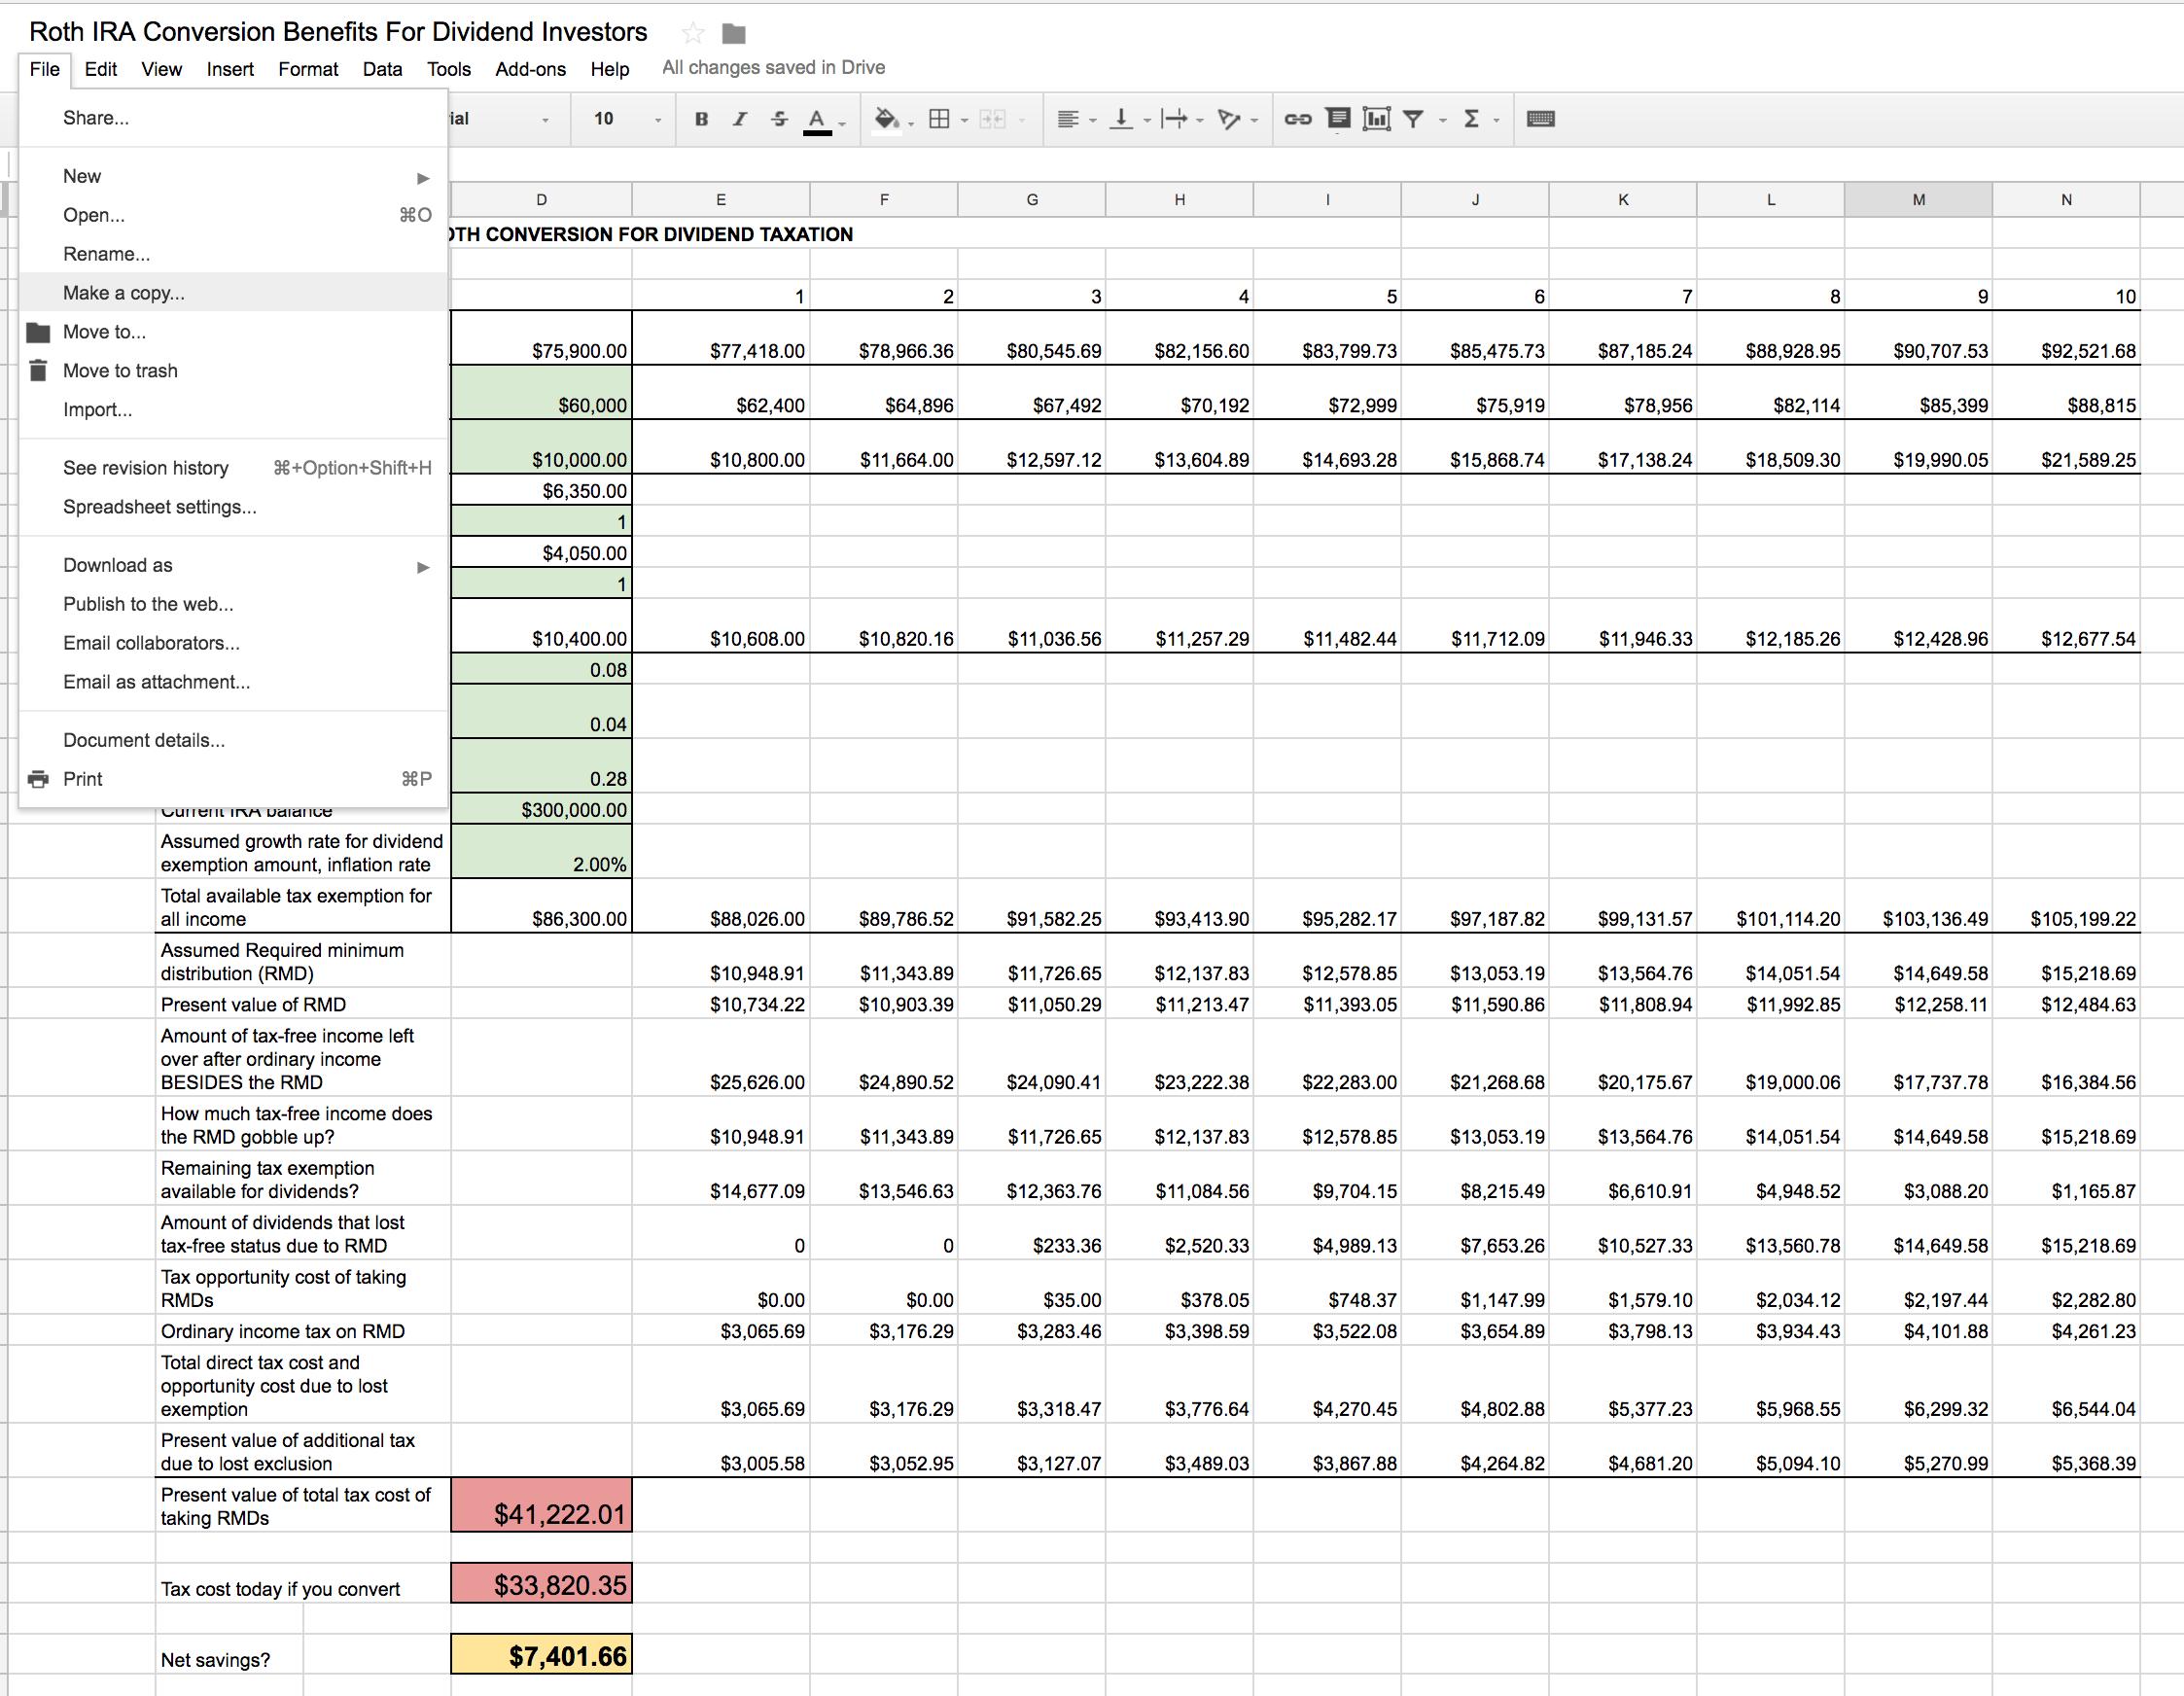 Capital Gains Tax Spreadsheet Shares With Regard To Roth Ira Conversion Spreadsheet  Seeking Alpha